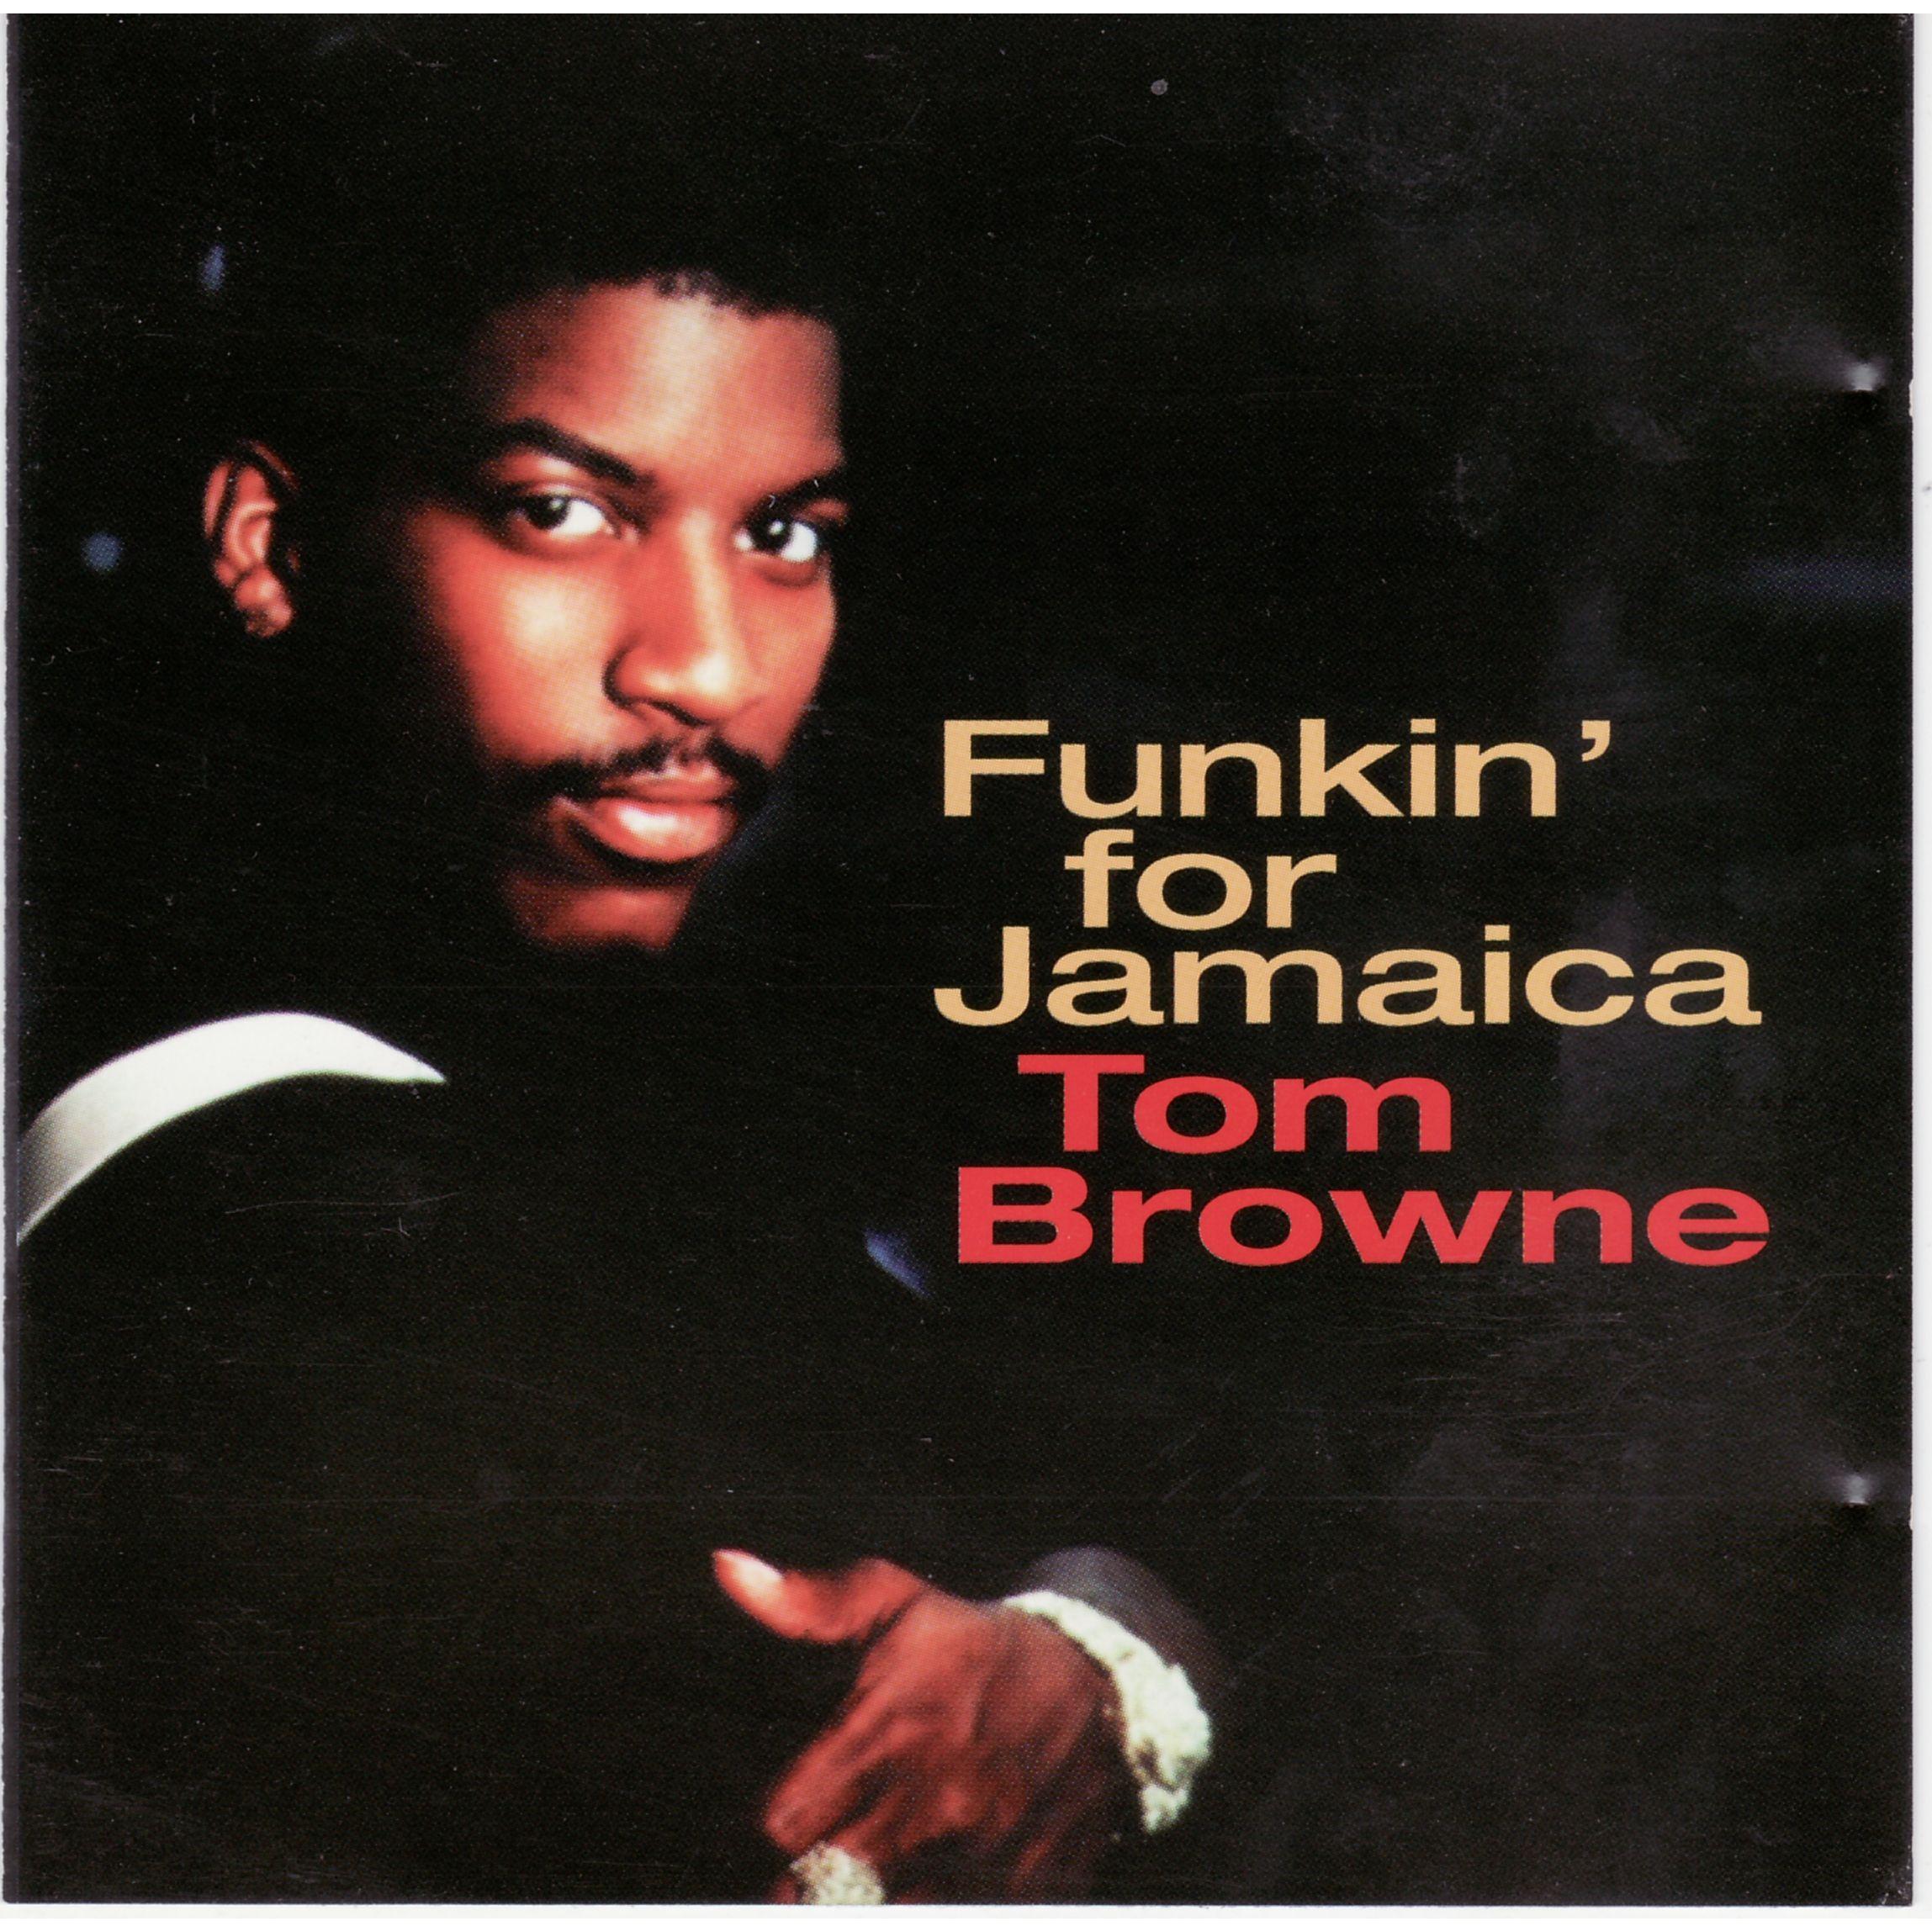 Funkin' for Jamaica Artwork